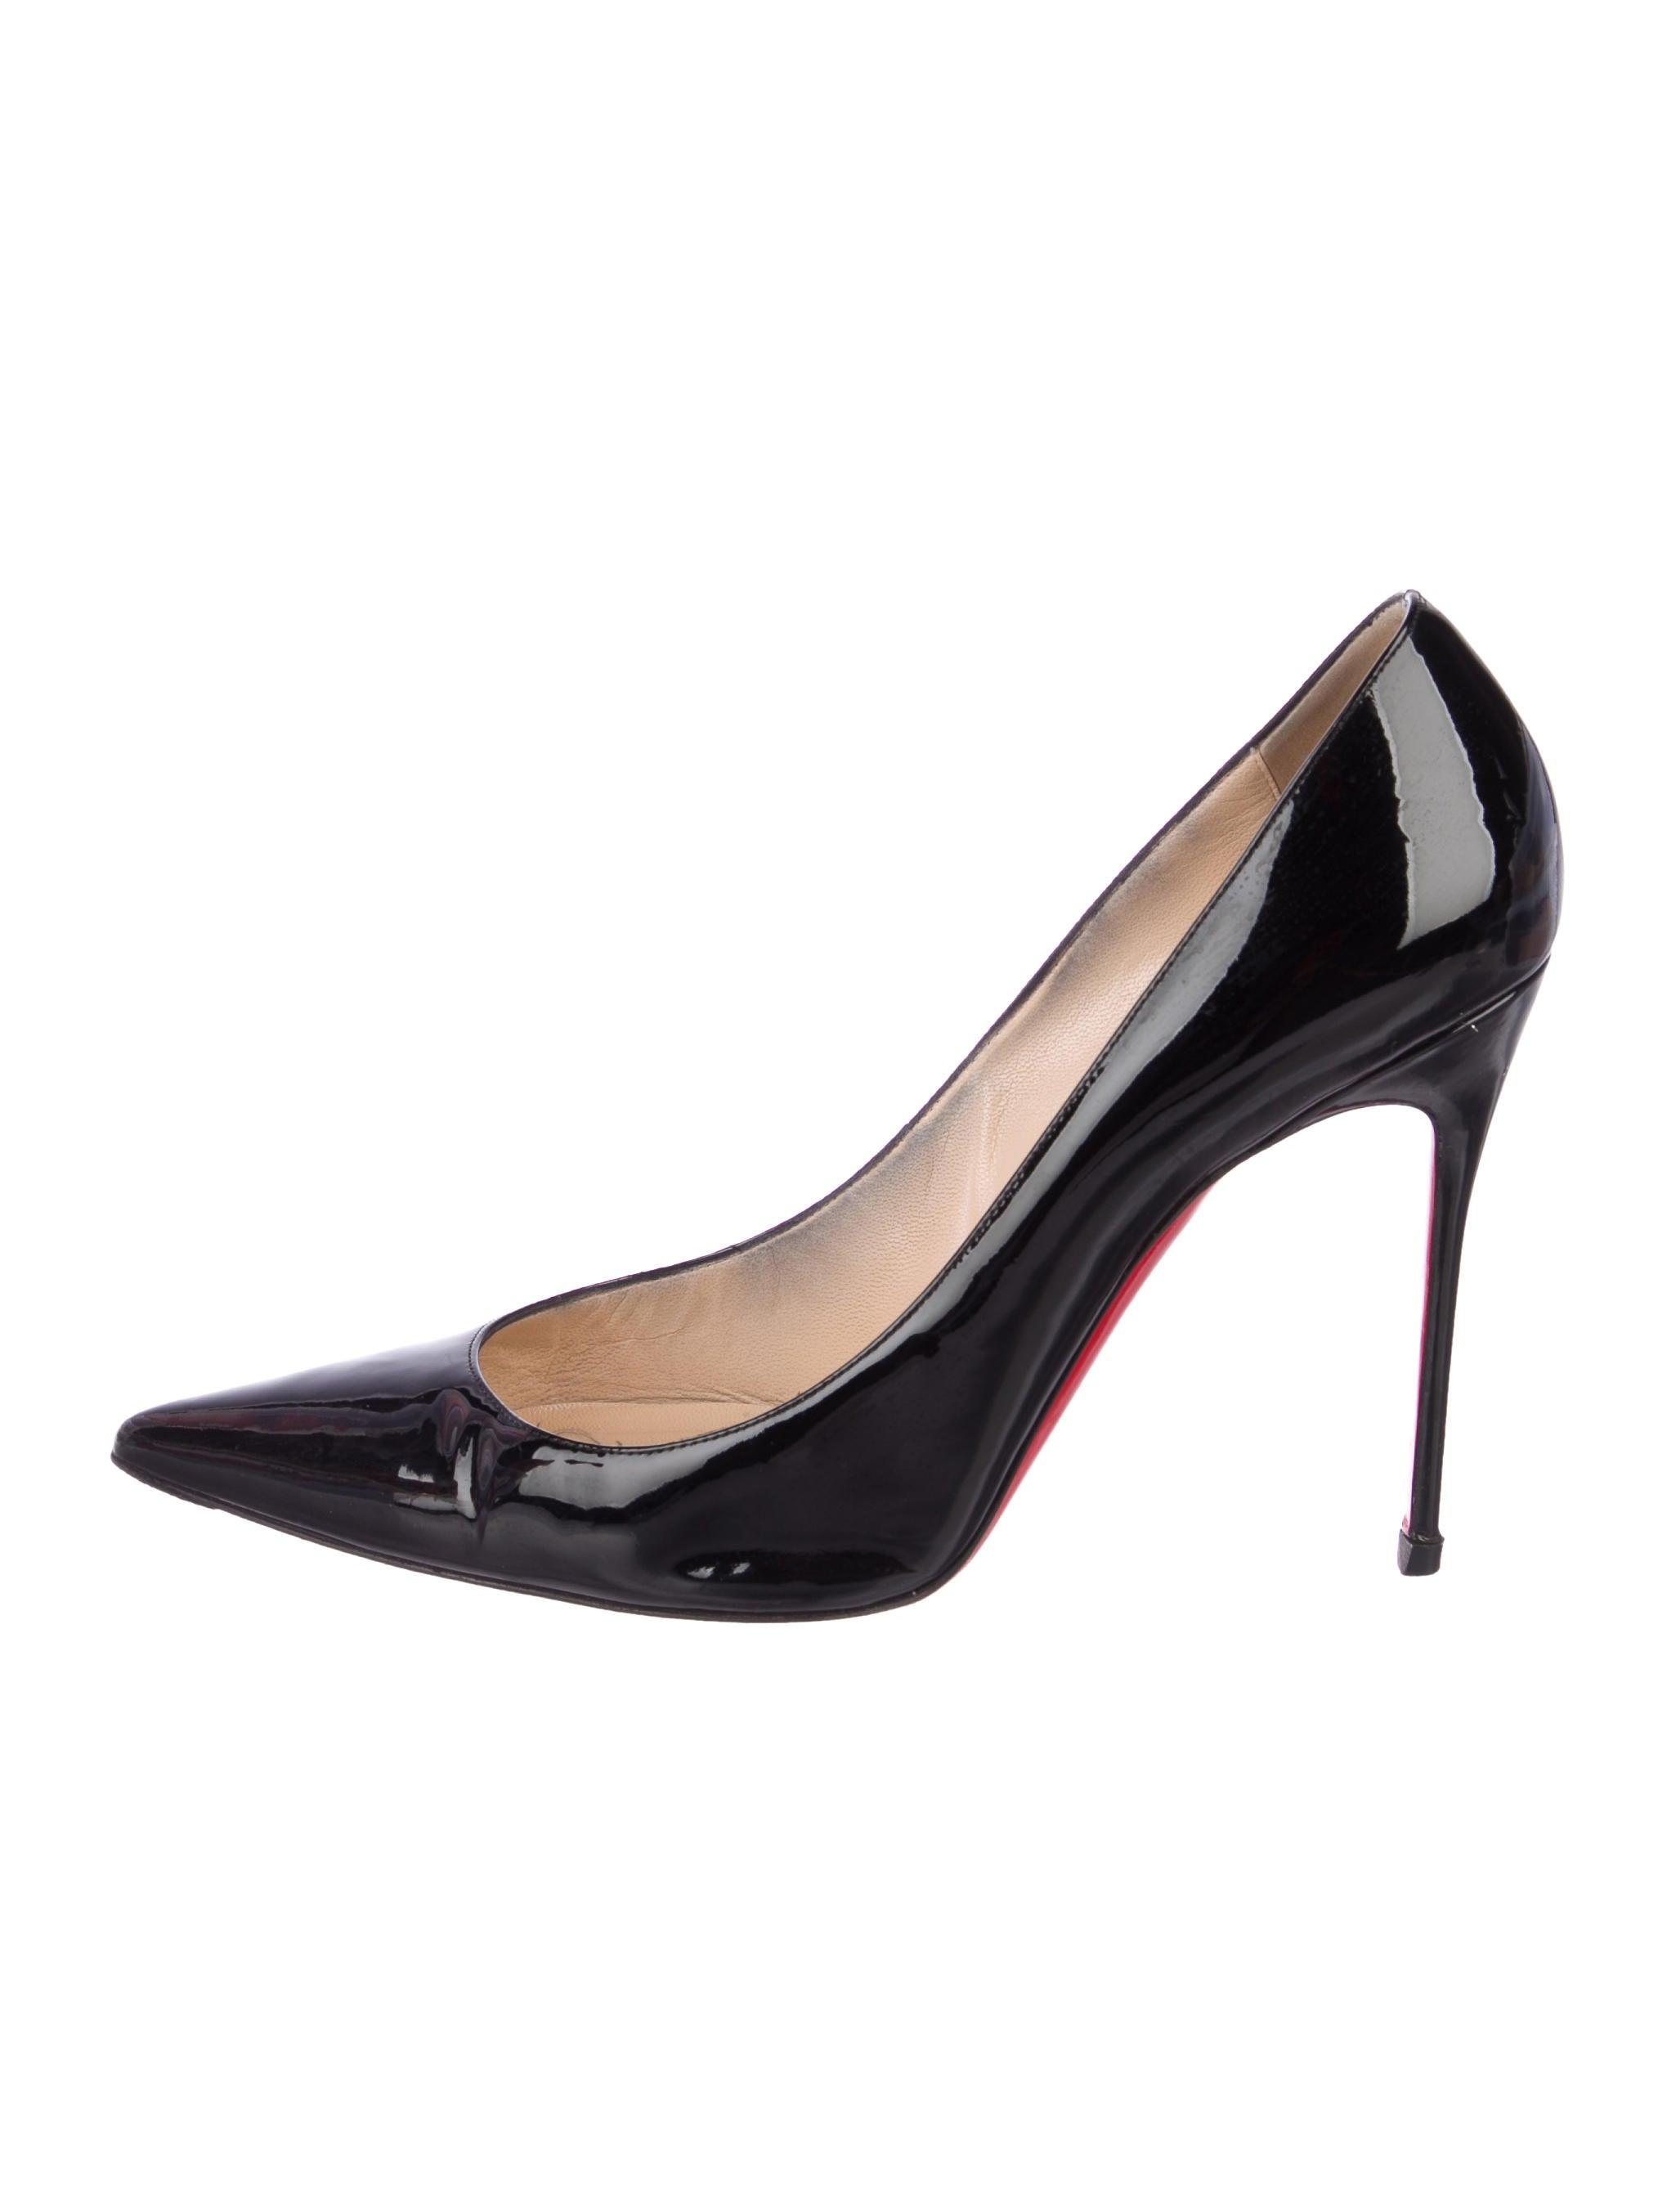 50bdbeb16883 Christian Louboutin Decollete 554 100 Patent Leather Pumps - Shoes ...